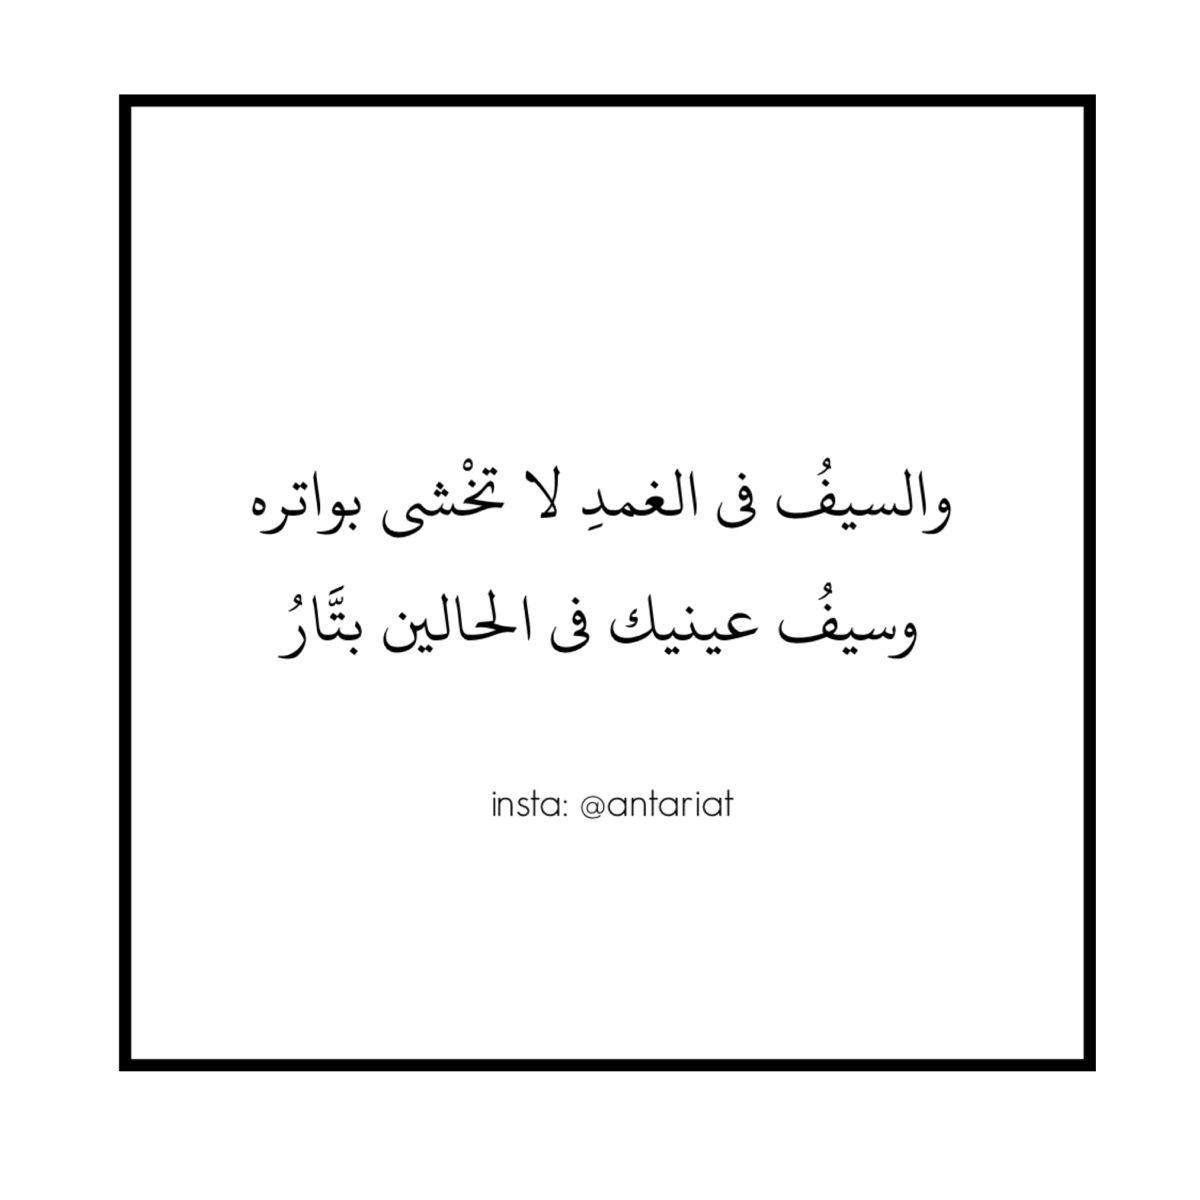 اقتباس شعر فصيح Beautiful Arabic Words Arabic Words Arabic Quotes